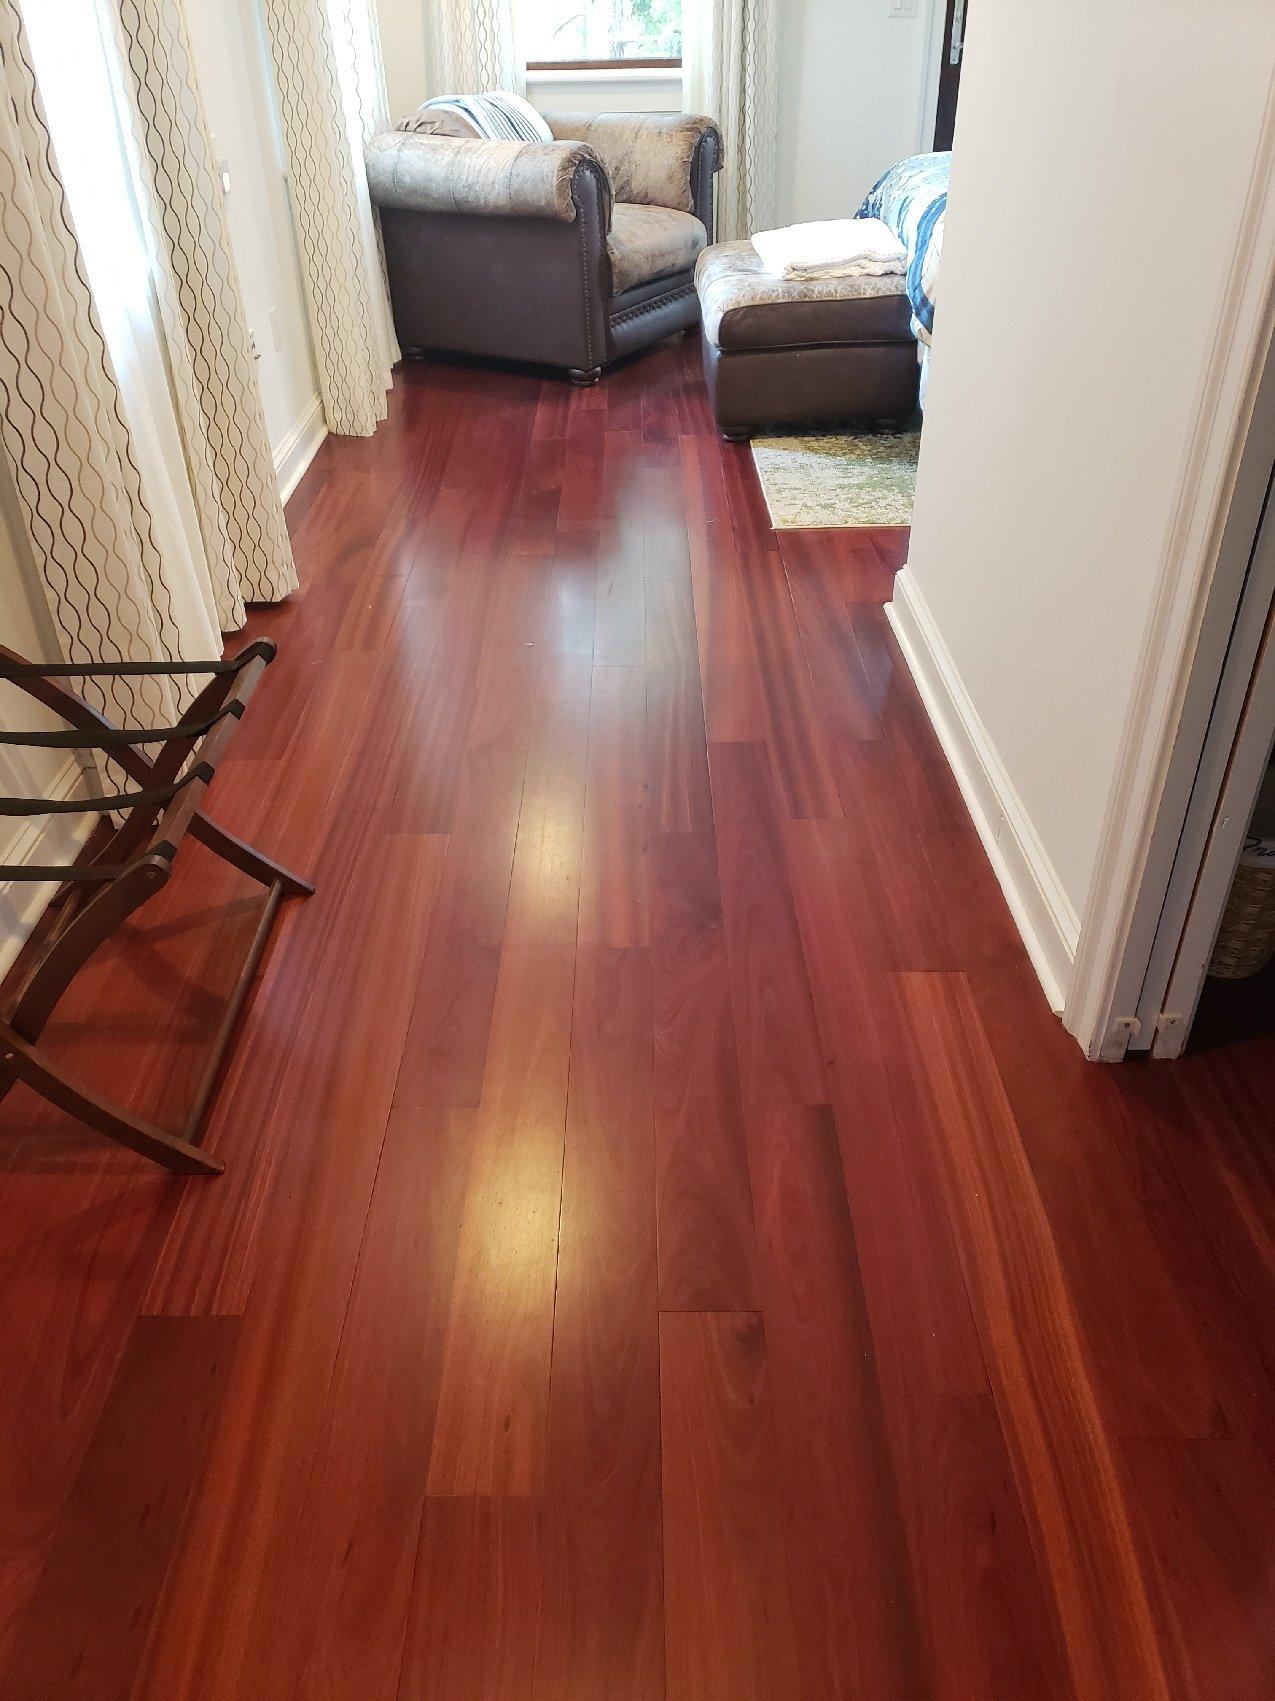 Wood Floors In Bella Vista Philadelphia